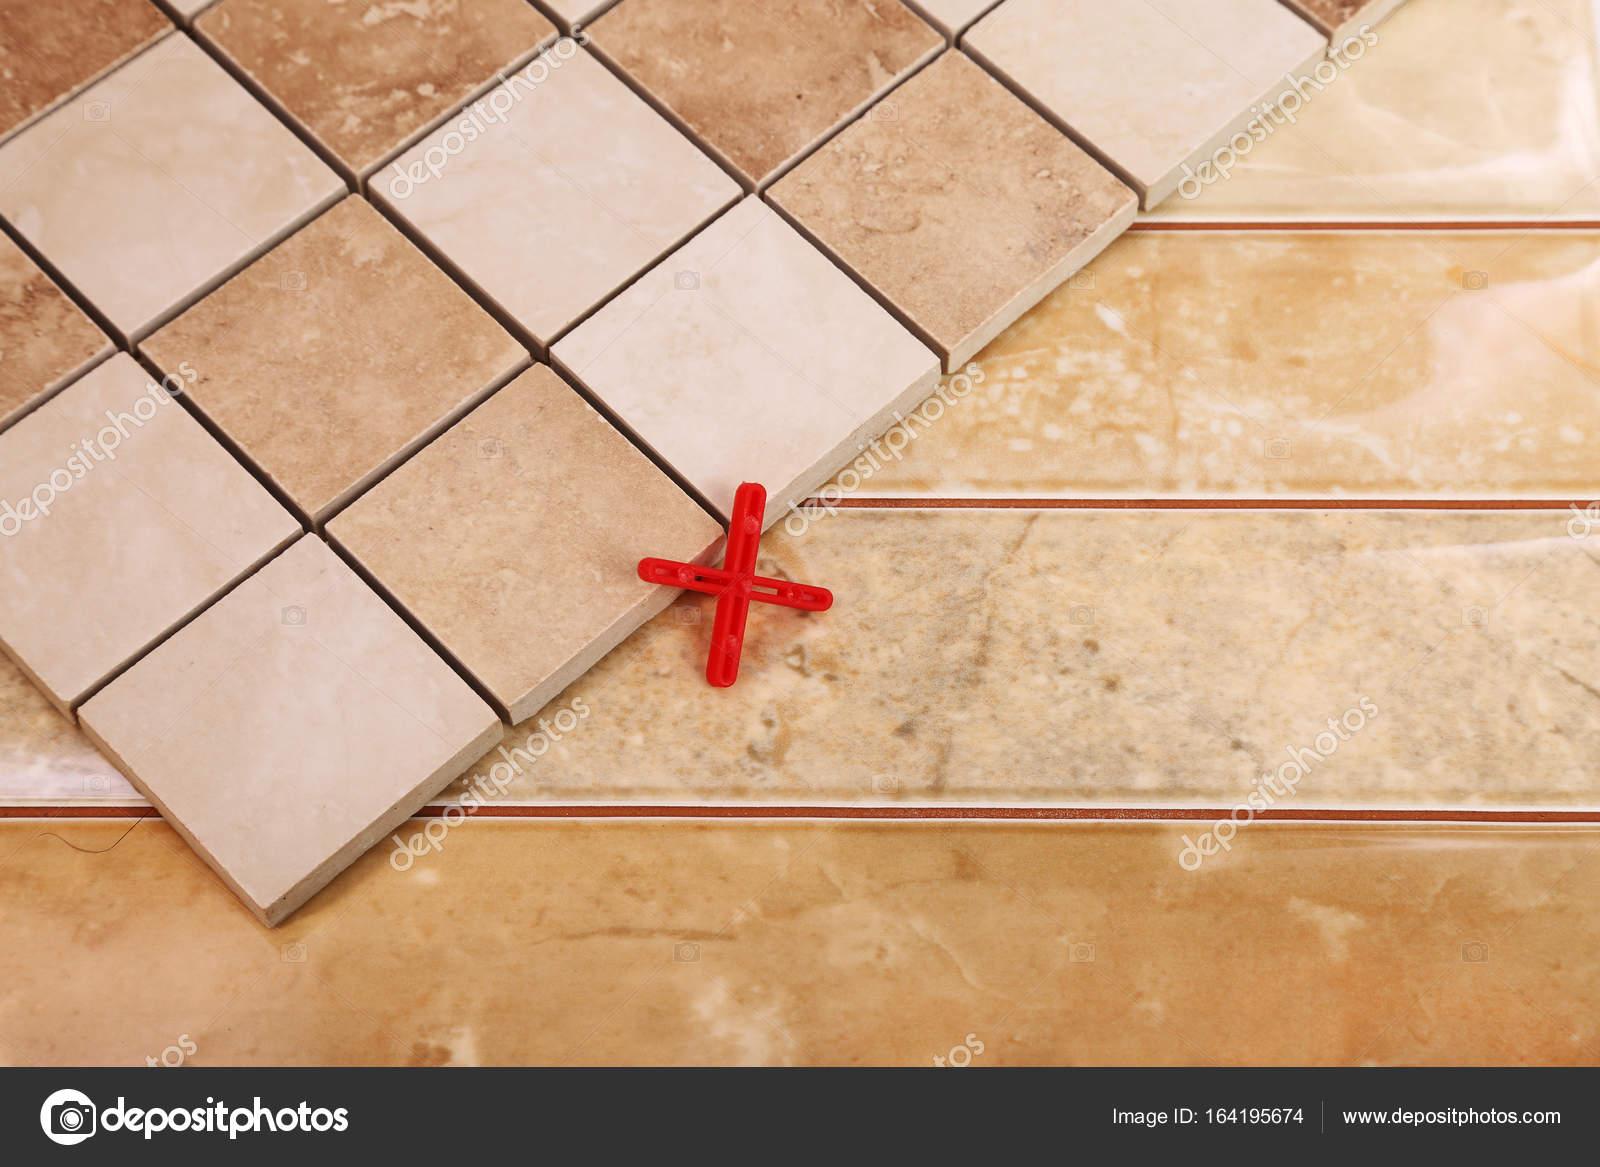 Popolari piastrelle per bagno e cucina — Foto Stock © -Taurus ...